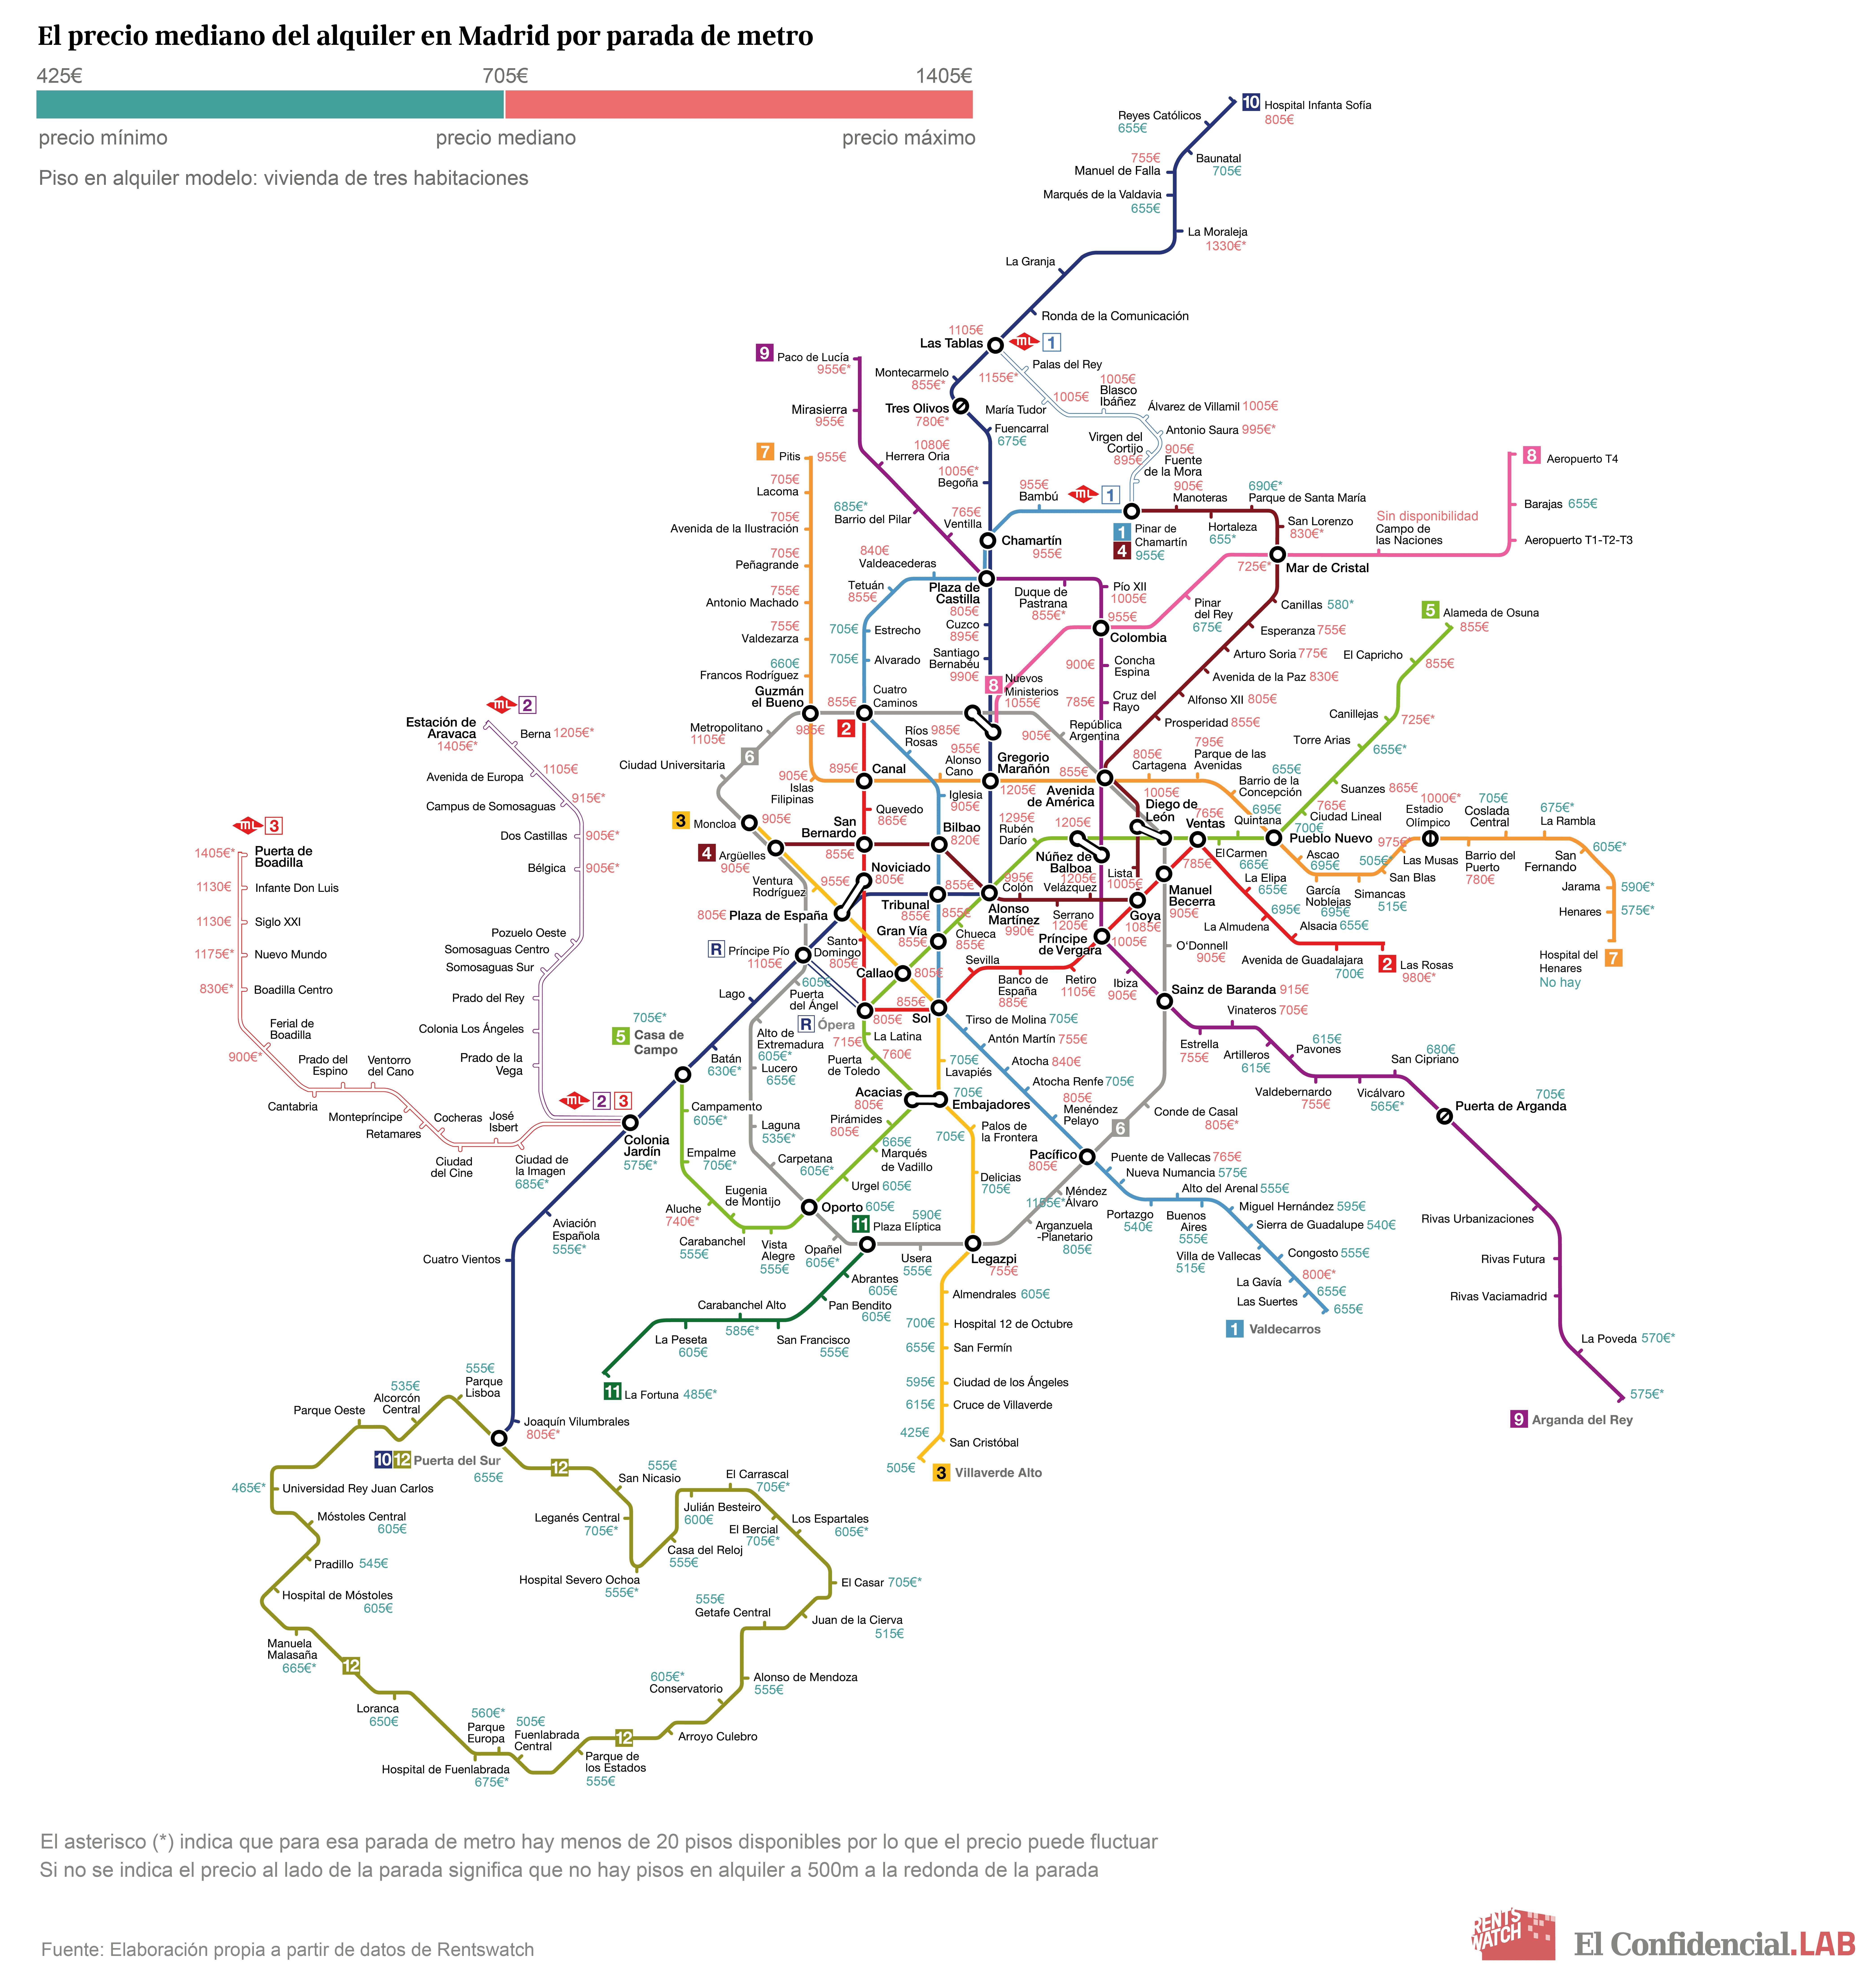 Metro madrid madrile o dime tu parada de metro m s for Precio del granito por metro